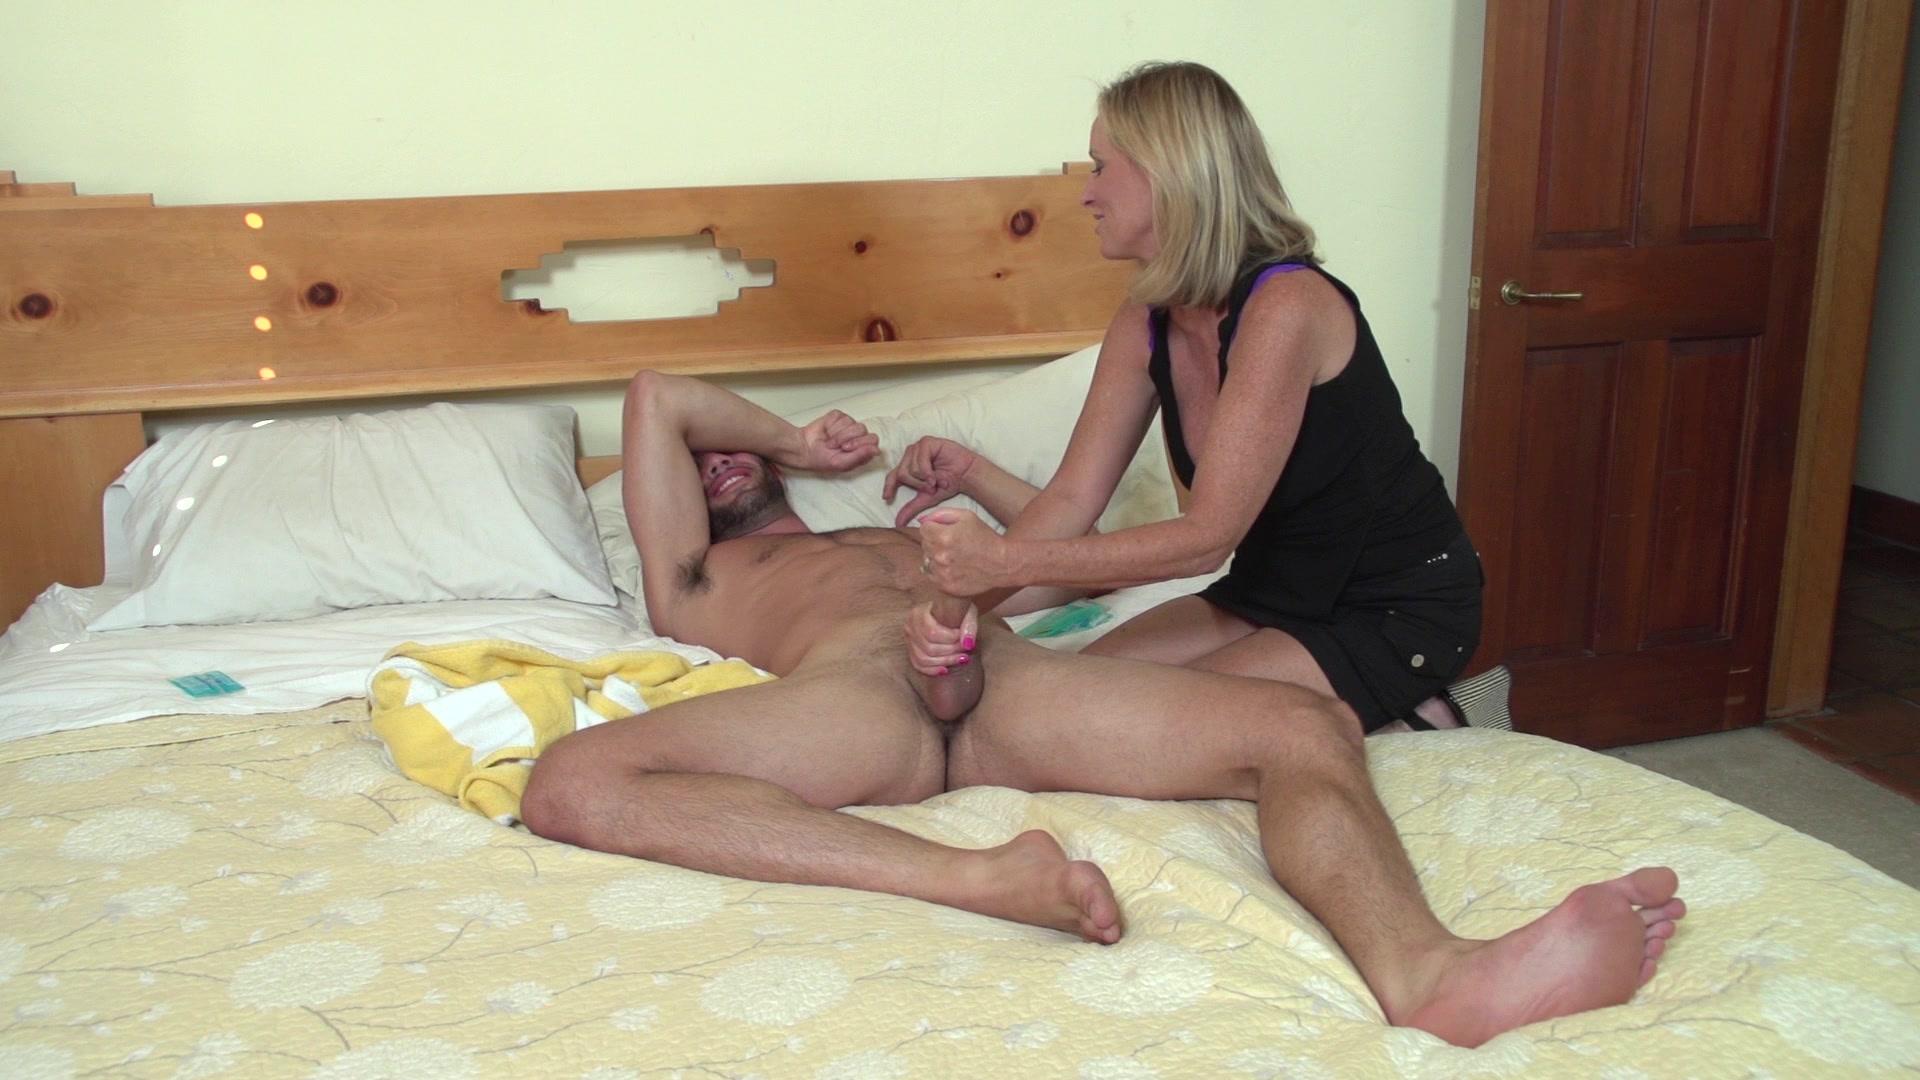 Супер секси мама для сына, Секс с мамой » Порно мамочки онлайн Full HD 22 фотография